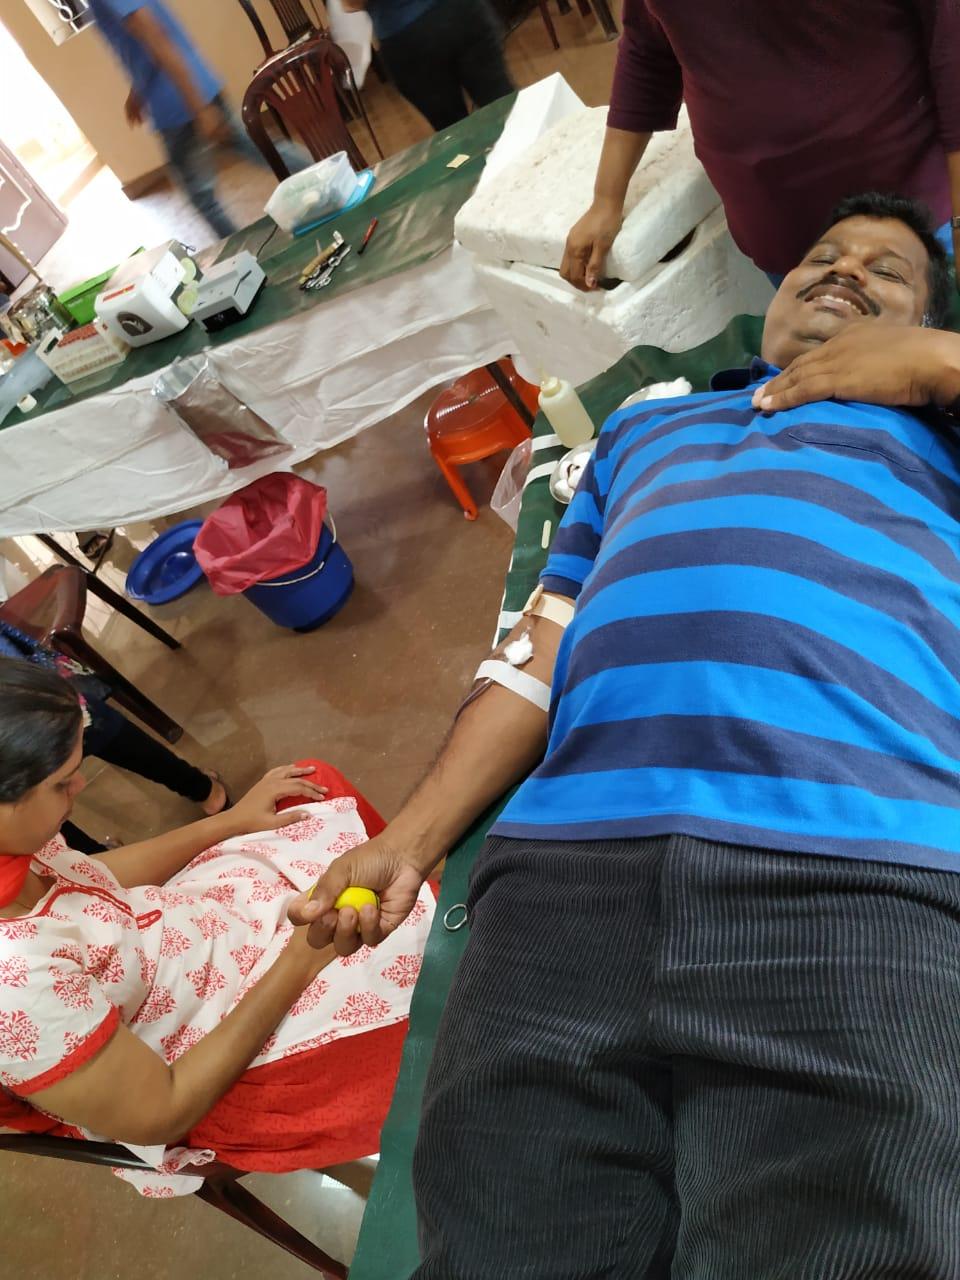 Cyprian_donating_blood.jpg